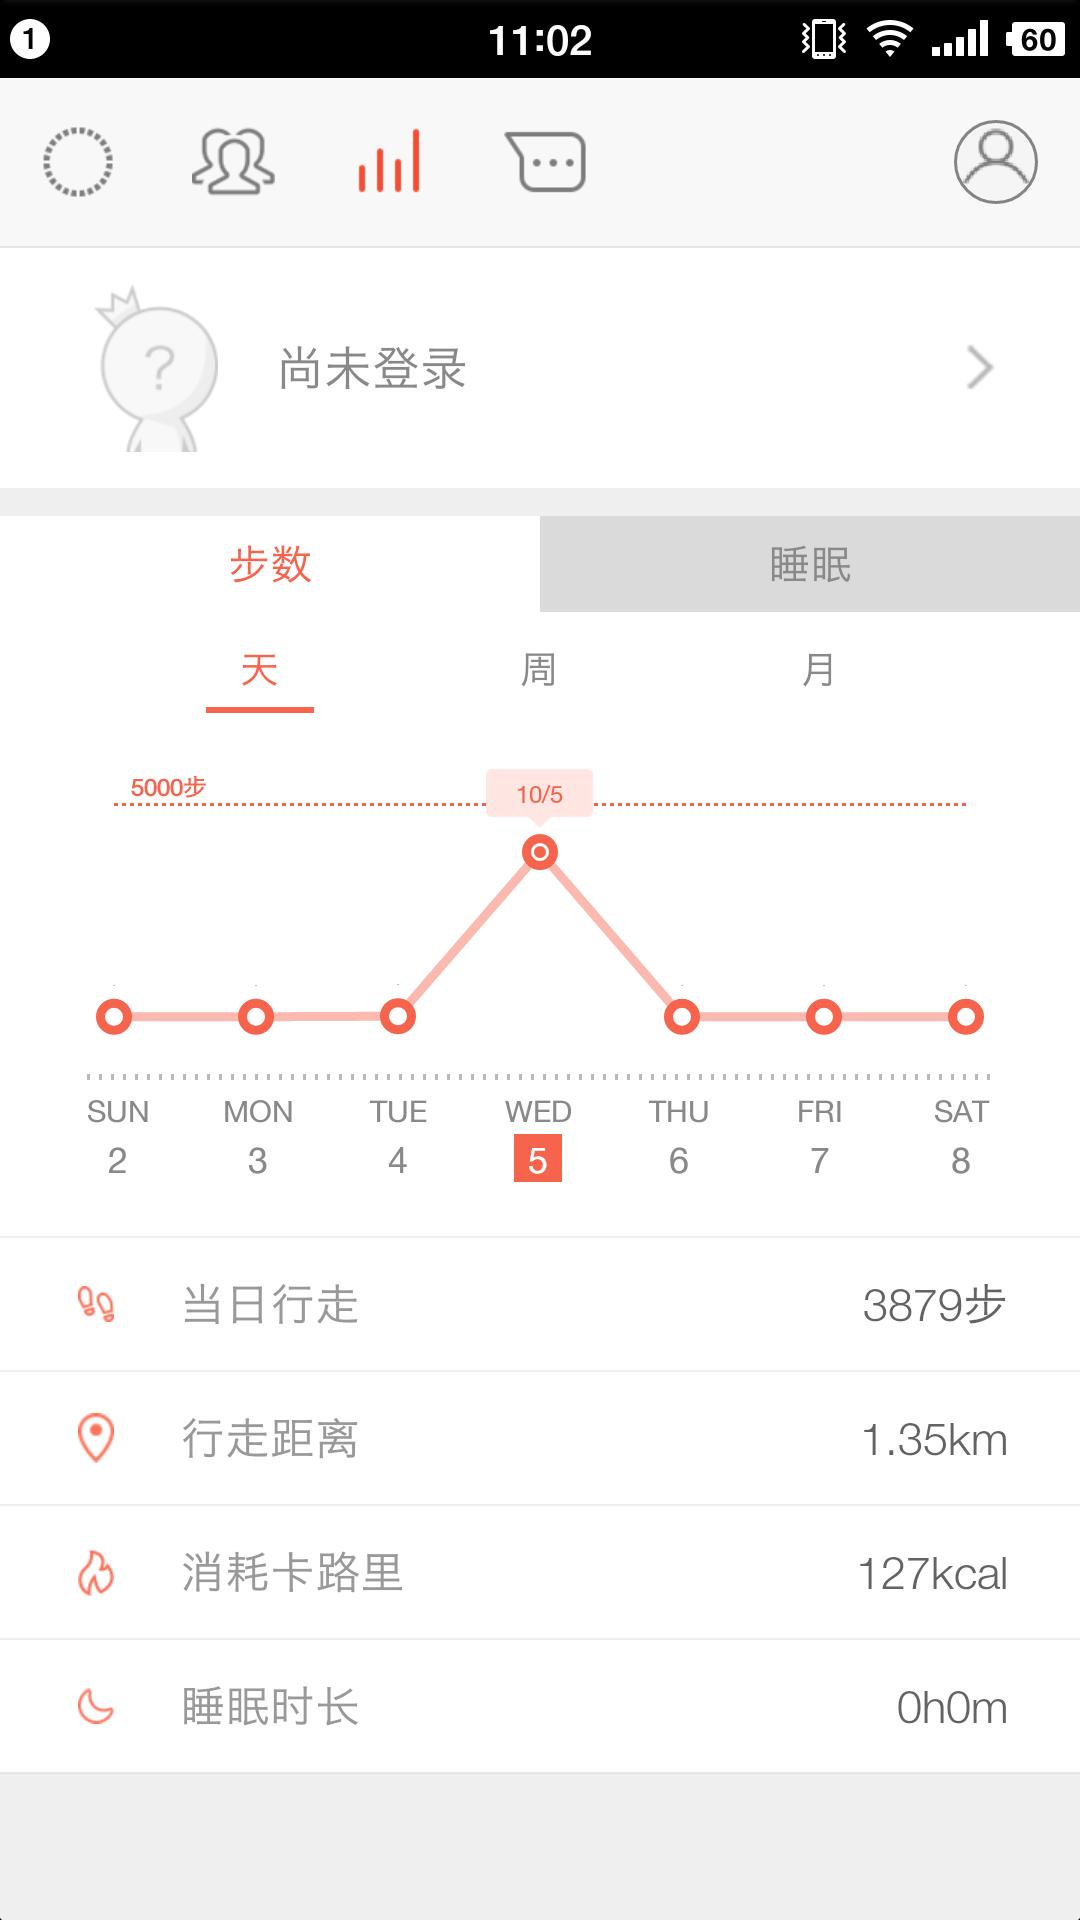 Screenshot_2016-10-09-11-02-10-477_春雨计步器.png